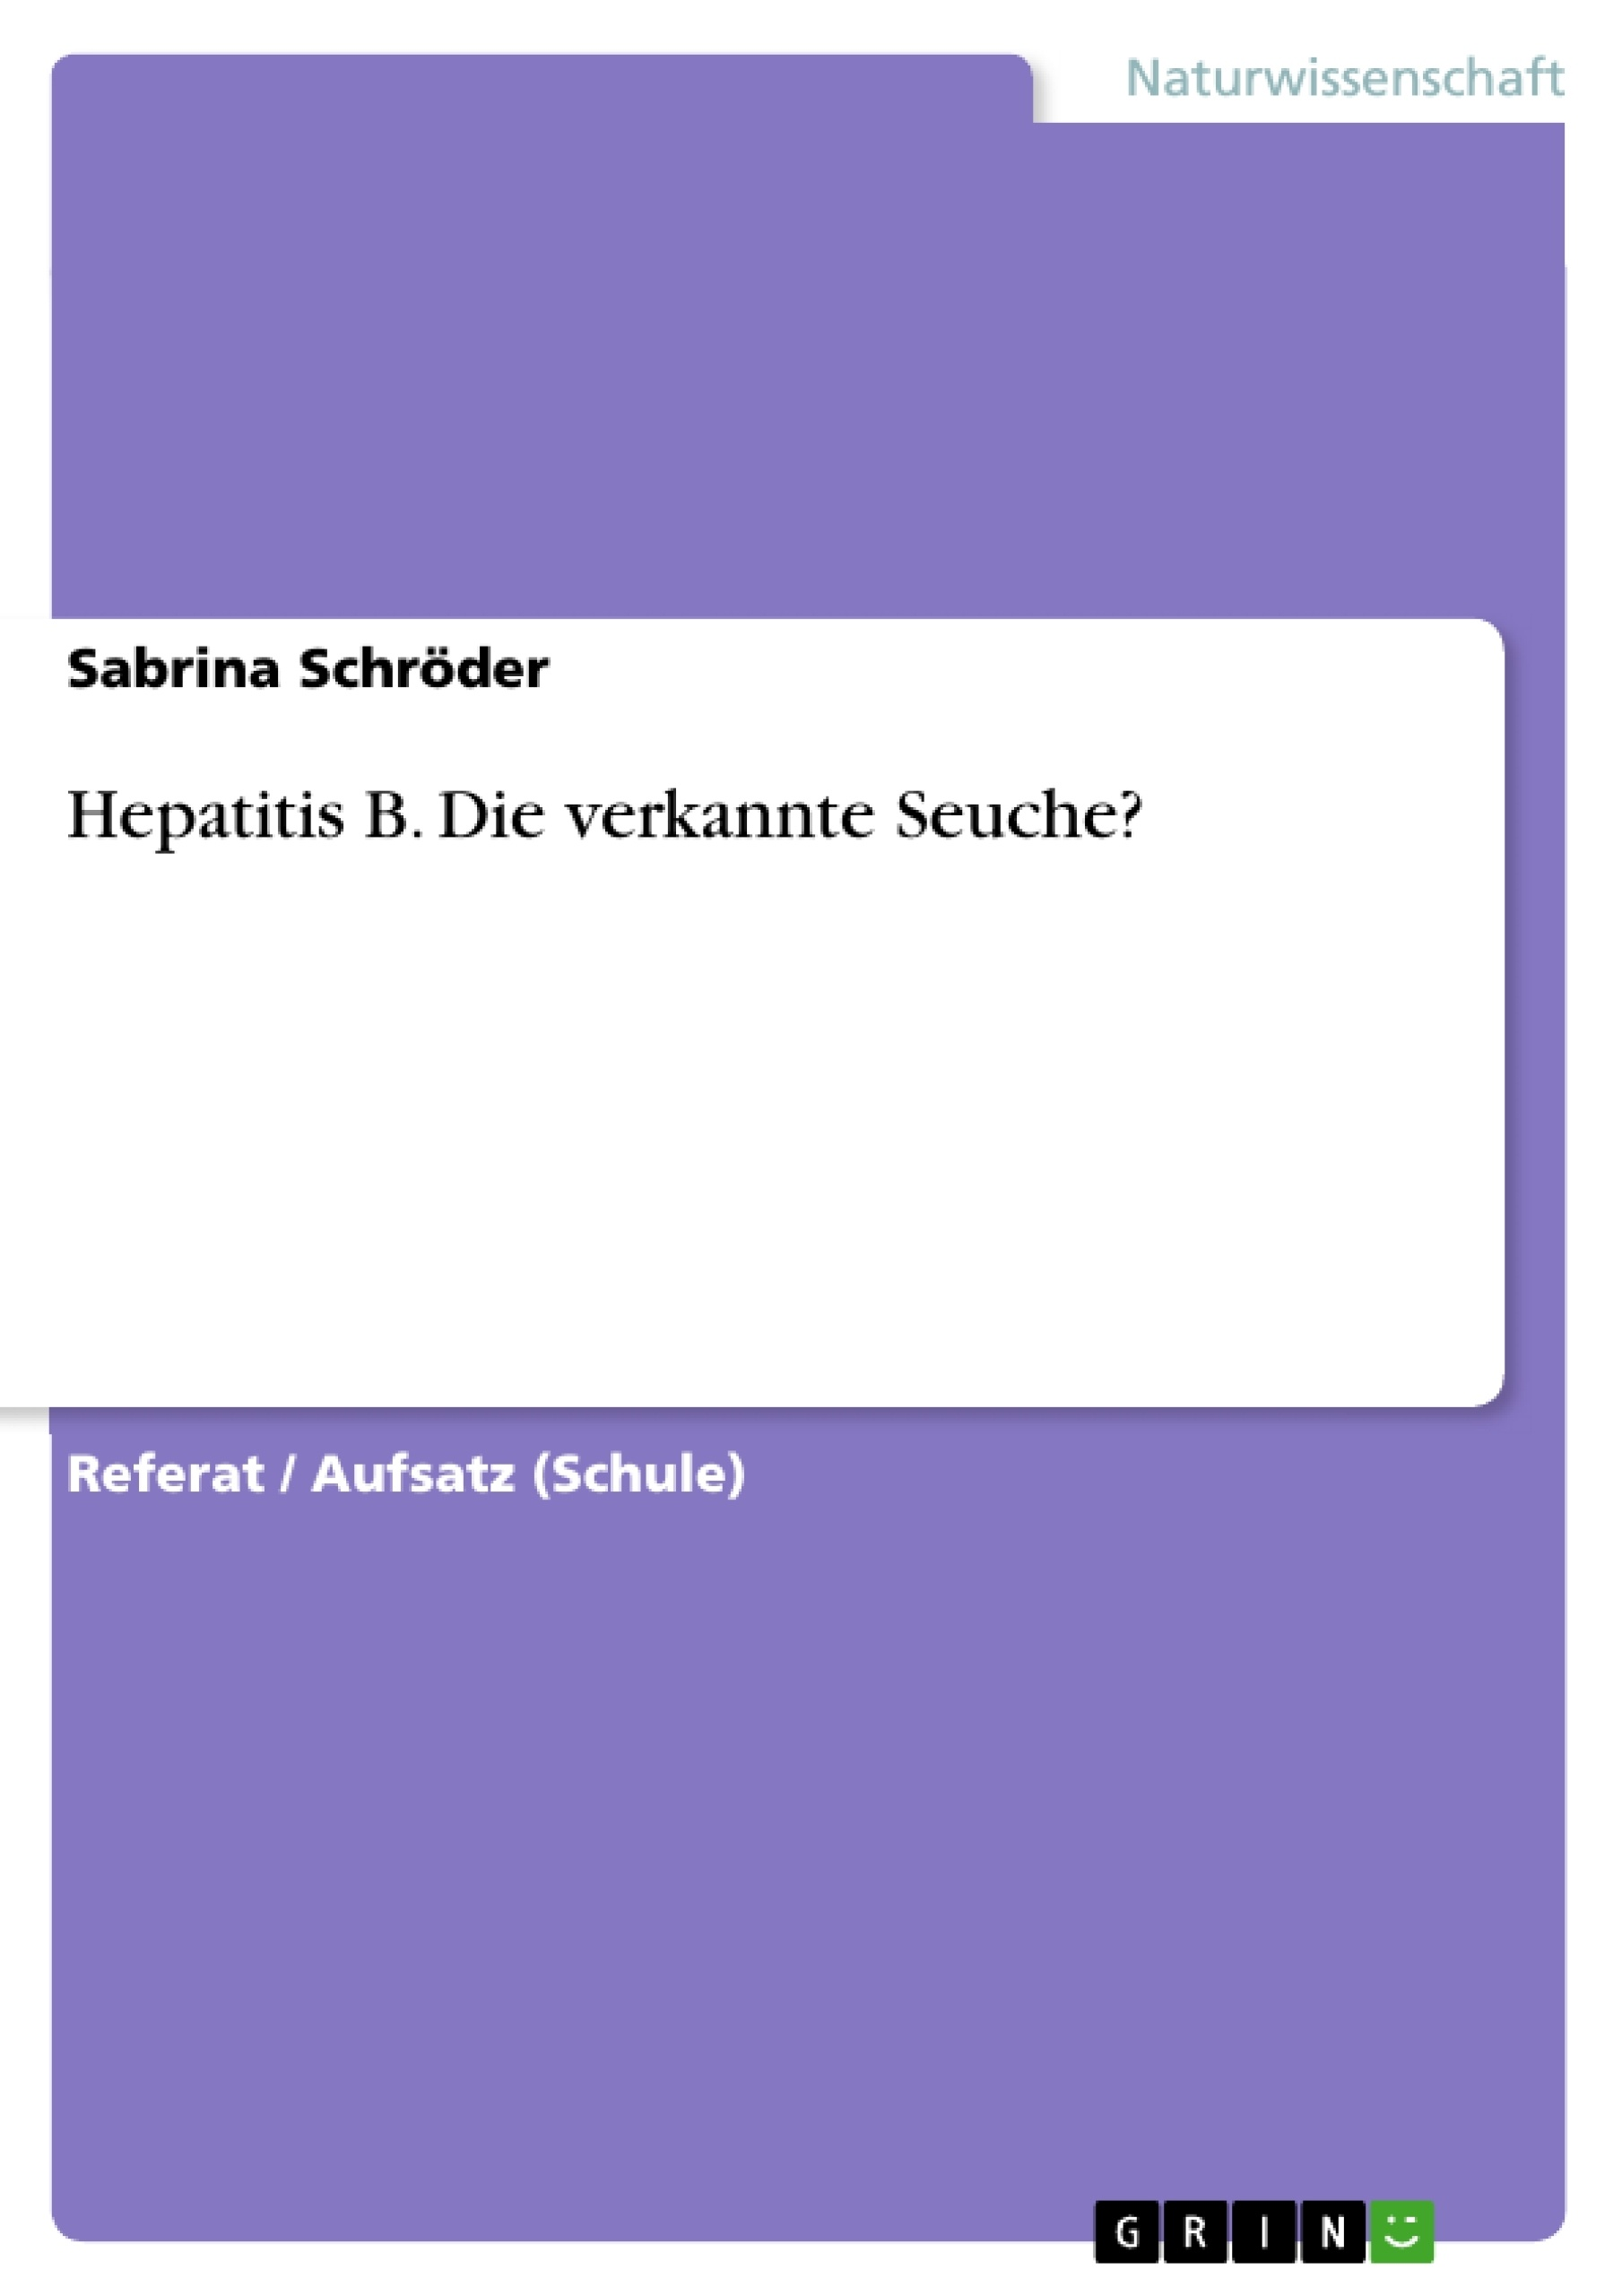 Titel: Hepatitis B. Die verkannte Seuche?